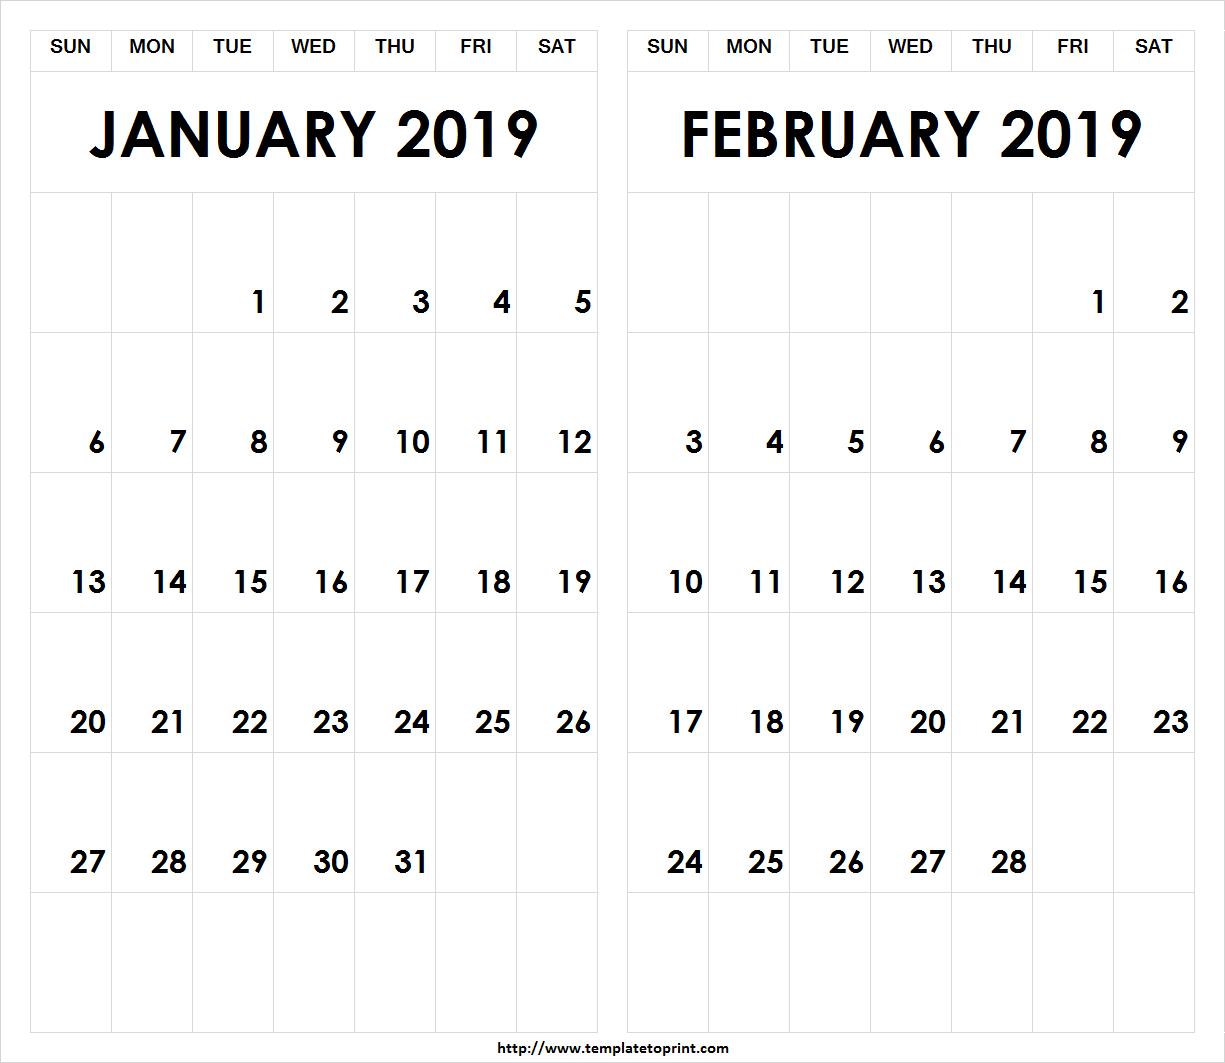 Printable 2019 January February Calendar » Template To Print Calendar 2019 Jan Feb